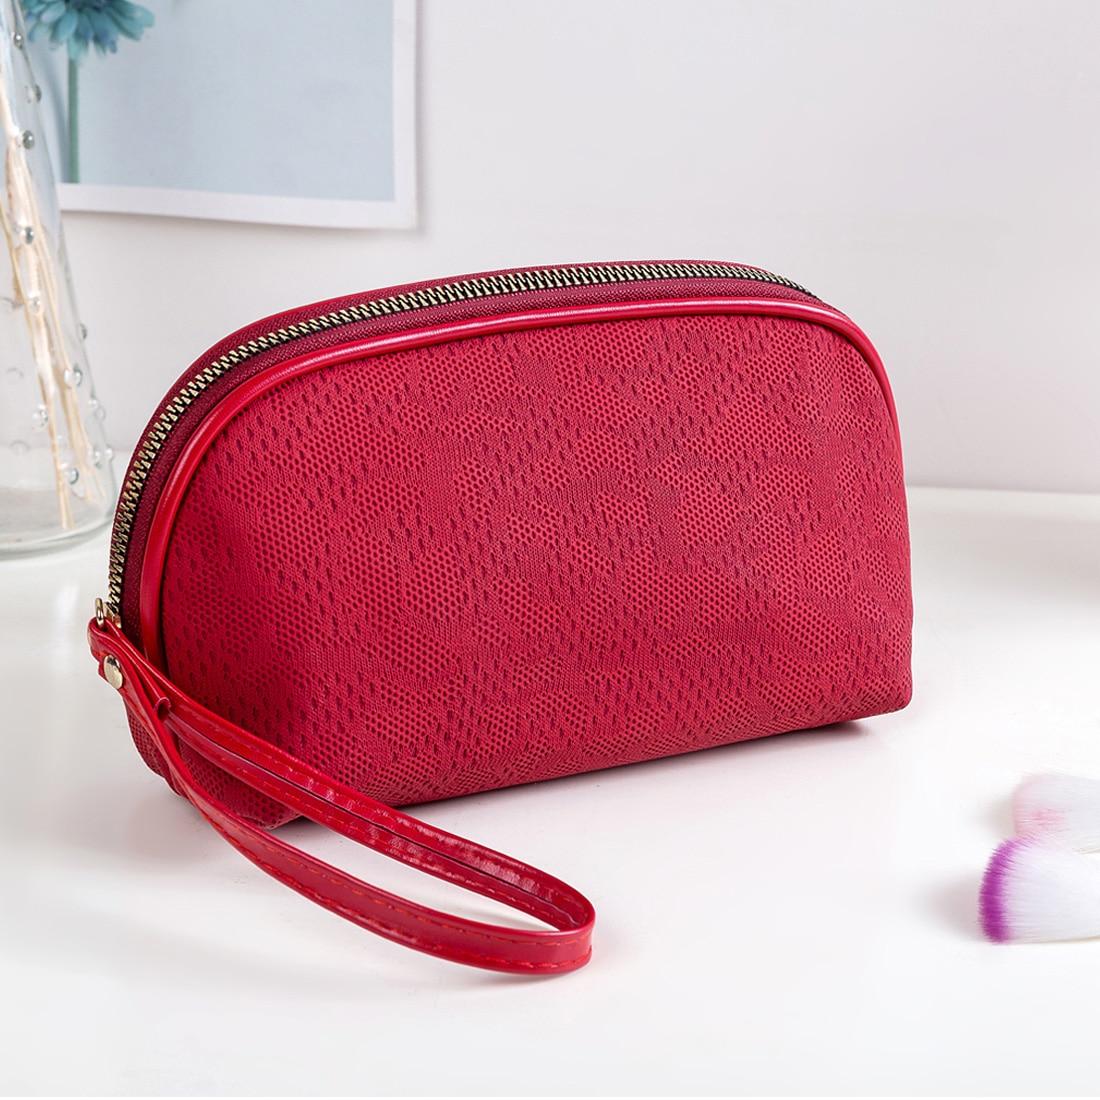 Organizer Pouch Clutch-Bag Make-Up-Bag Women Portable